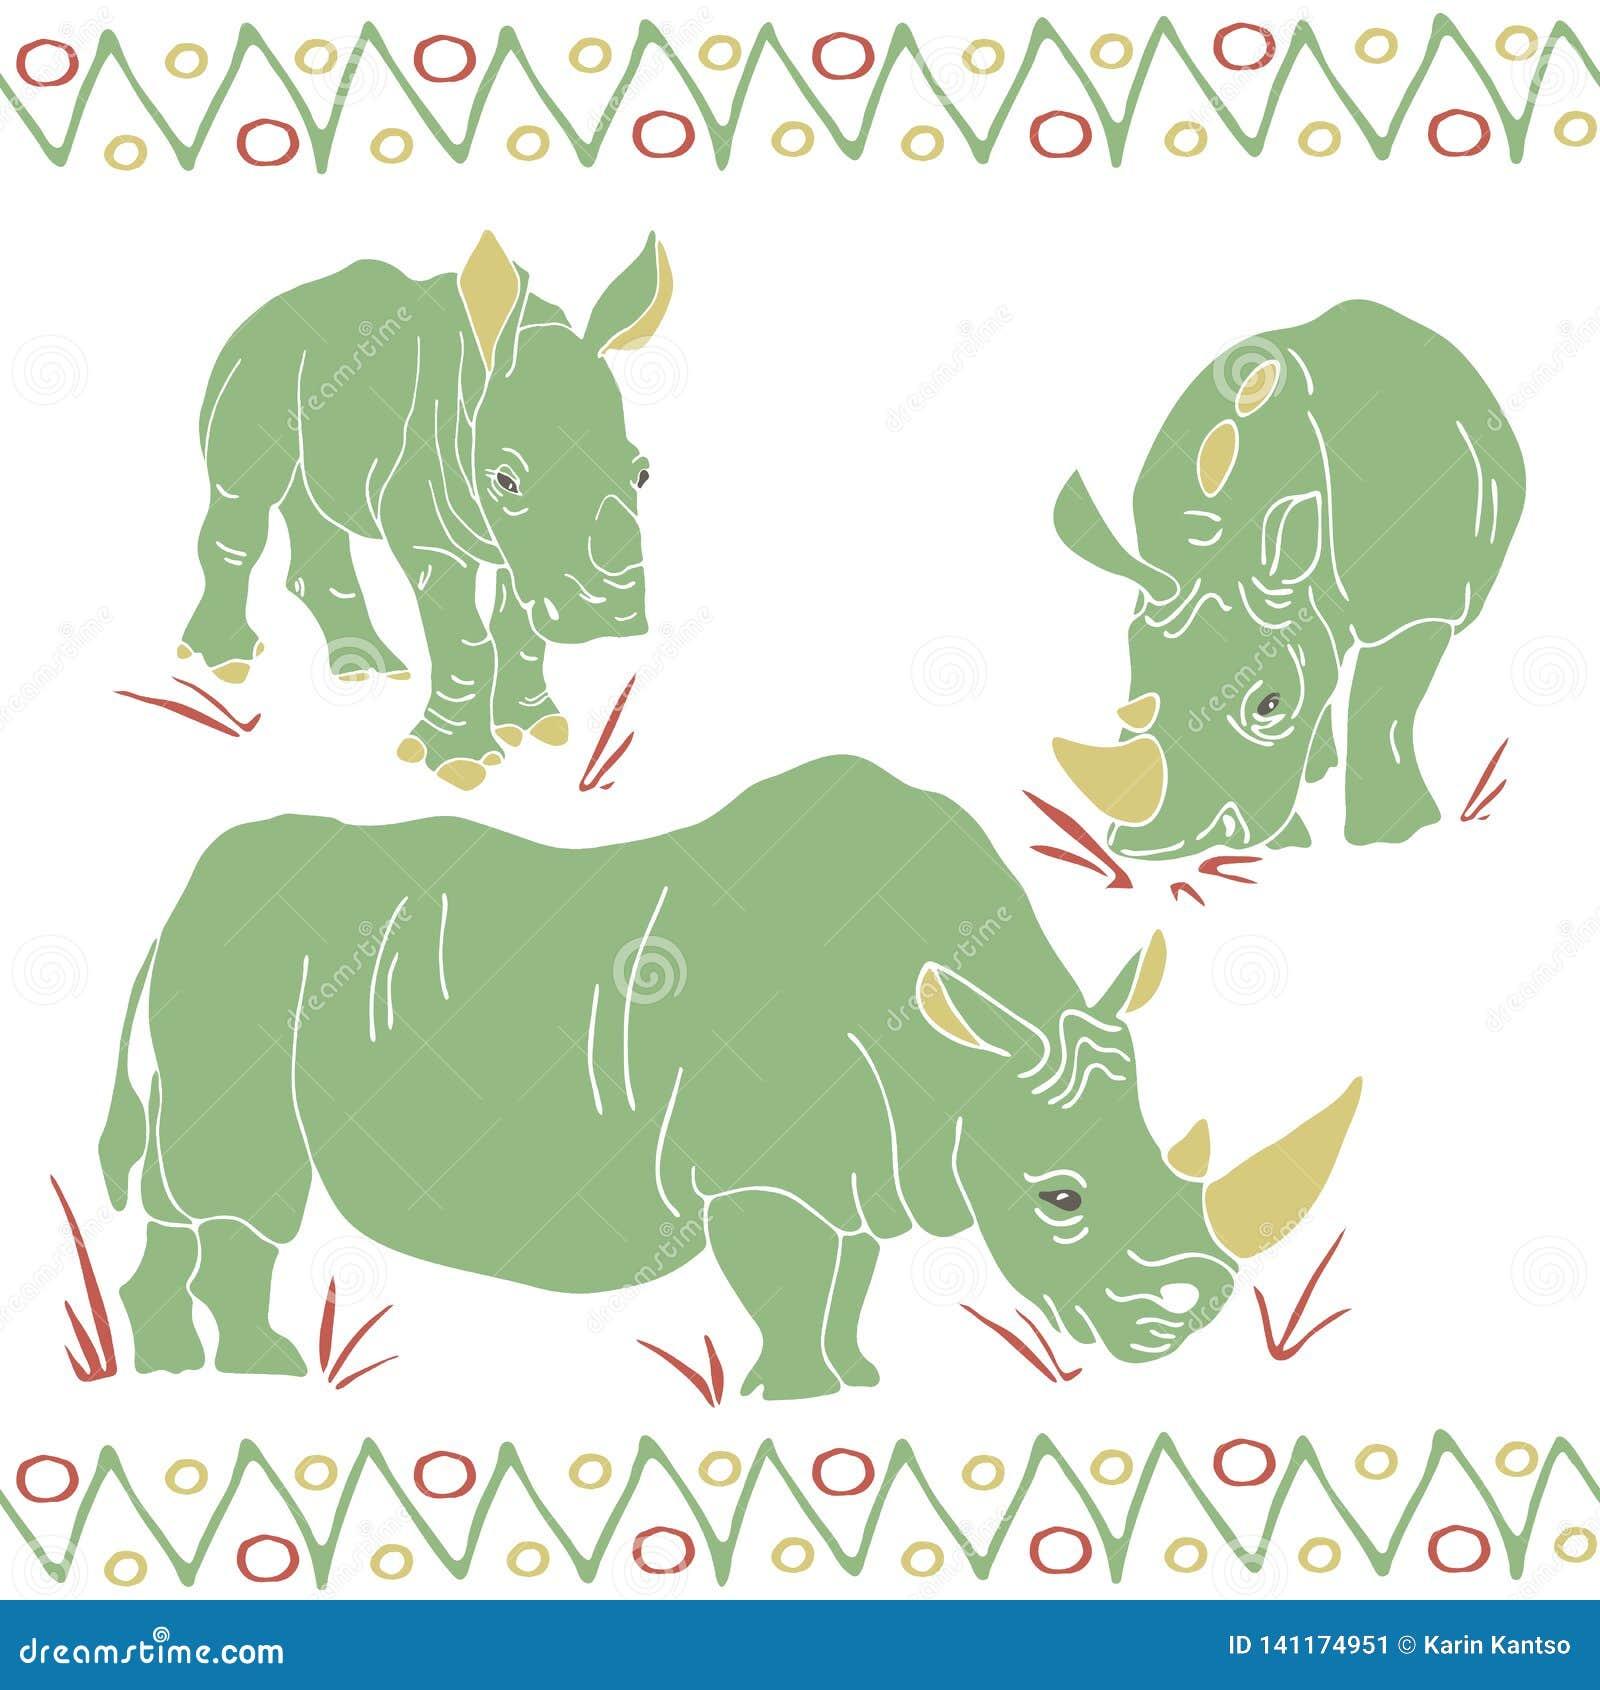 Vektor lokalisierte Nashörner Mutter und Kindermuster